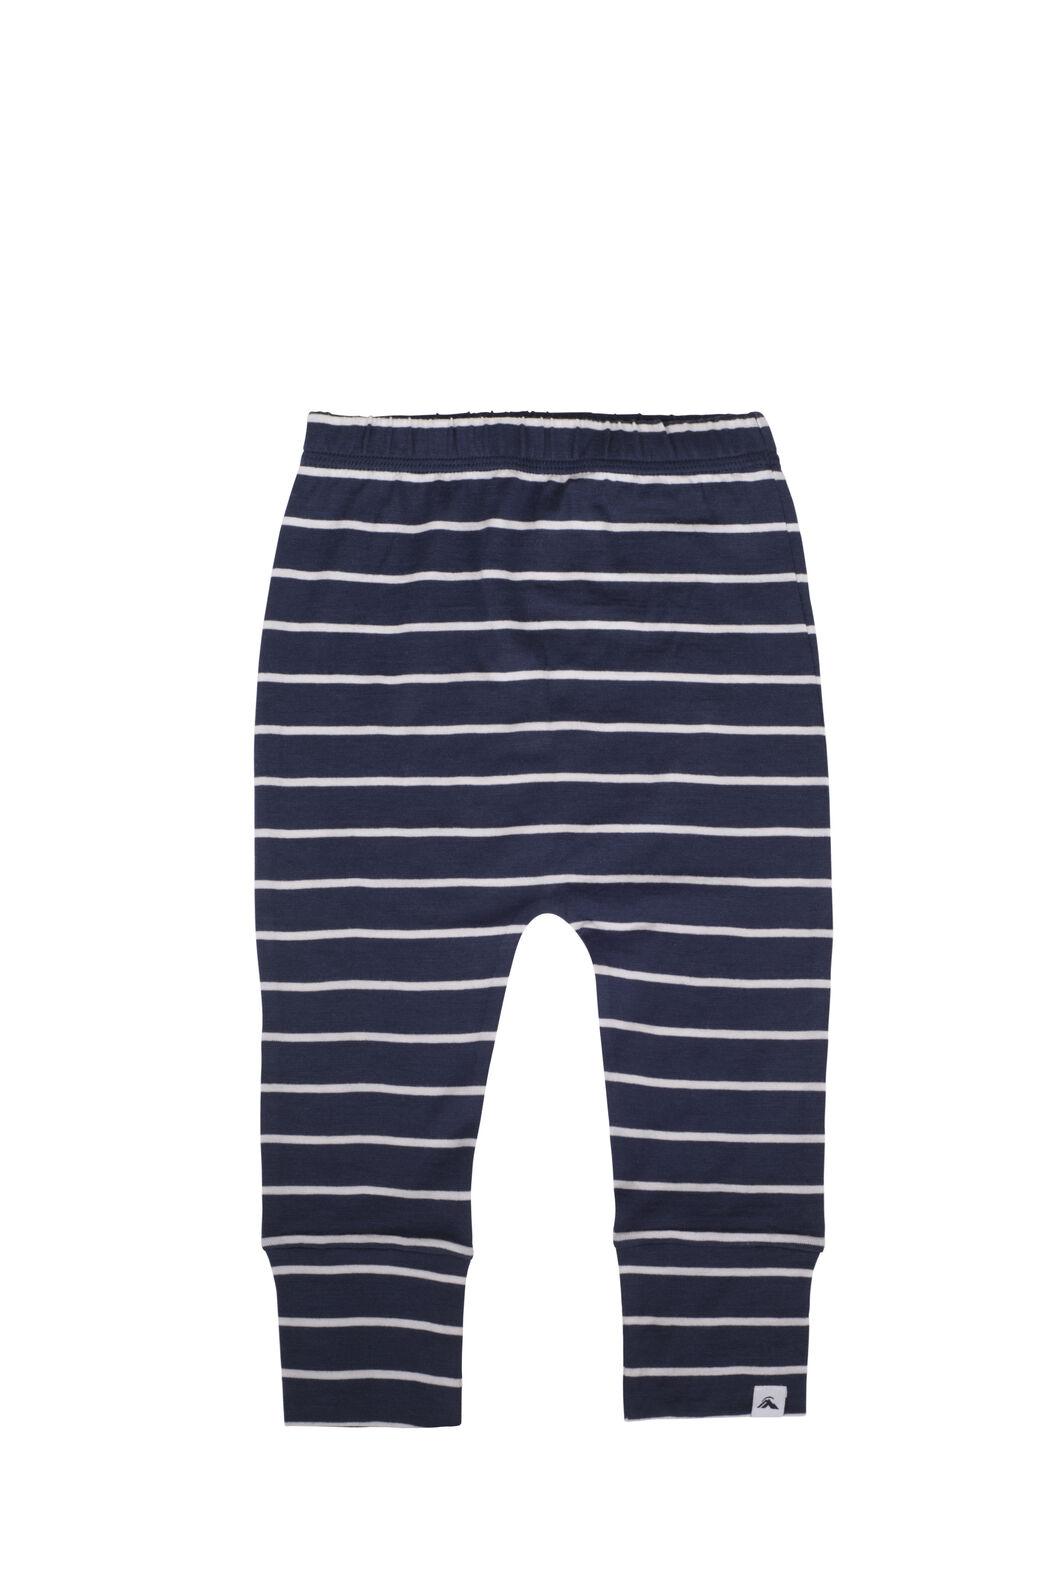 Macpac 150 Merino Long Johns - Baby, Navy Stripe, hi-res